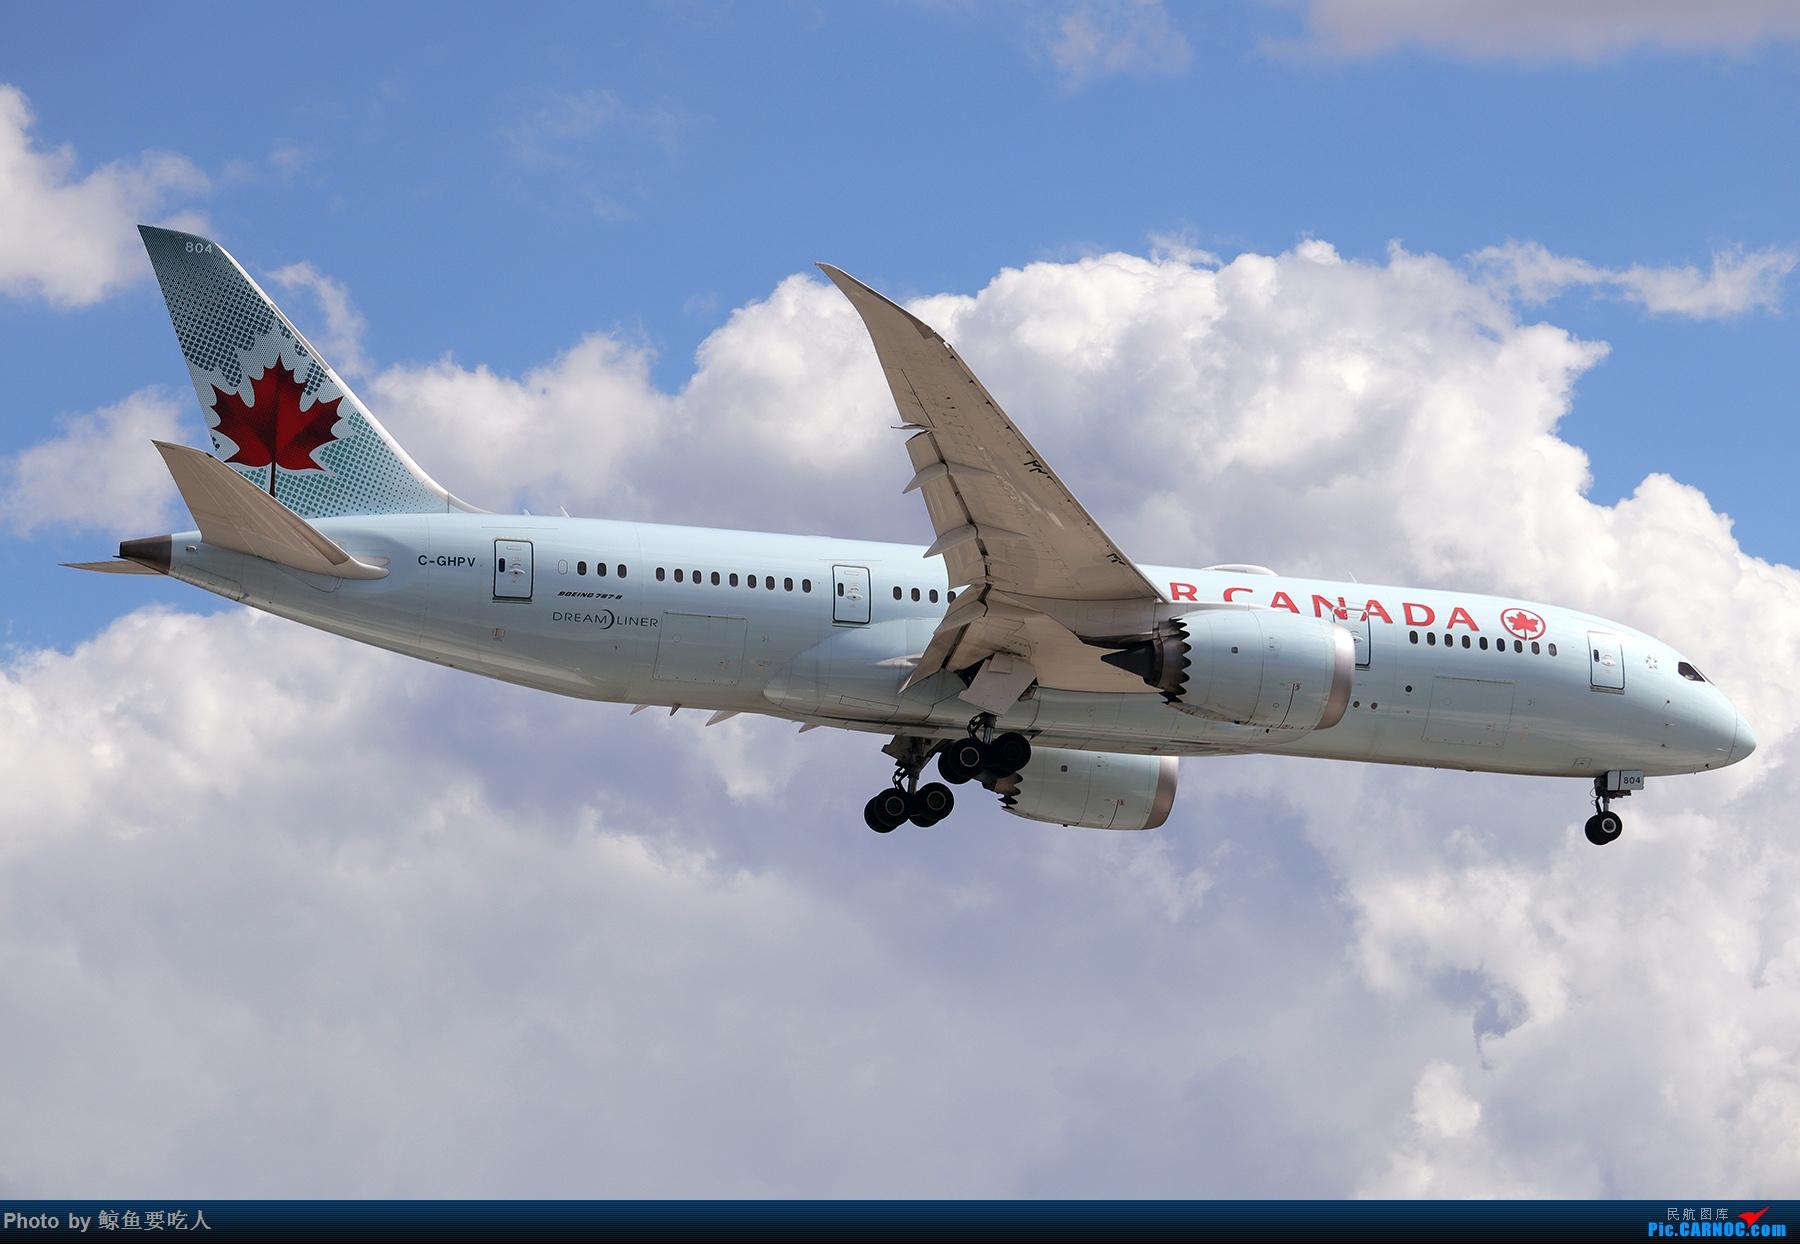 Re:[原创]【多图党】见证疫情后逐步的恢复,加拿大夏日多伦多皮尔逊机场拍机~ 乐见诸航空公司复航多伦多 BOEING 787 C-GHPV 多伦多皮尔逊国际机场